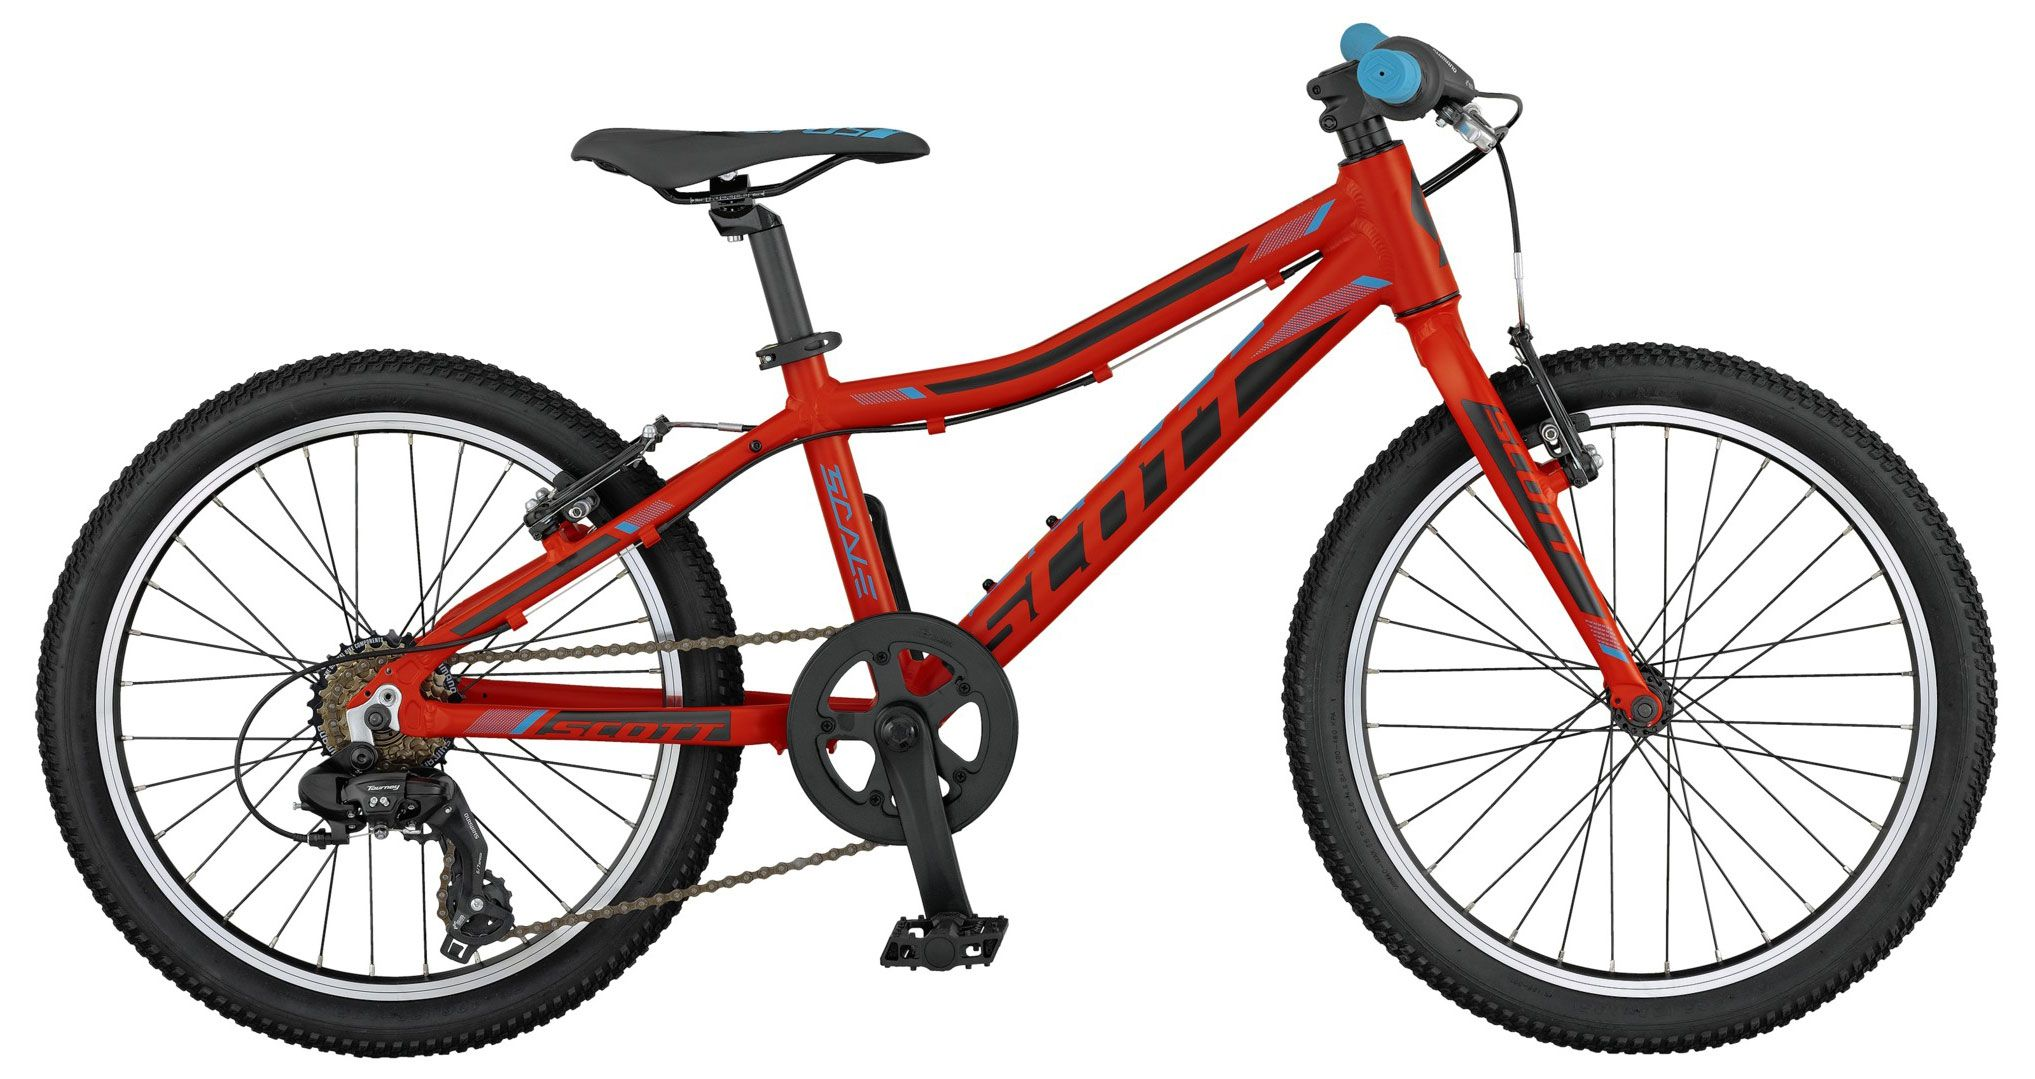 Велосипед Scott Scale JR 20 rigid fork 2017 велосипед scott scale jr 24 rigid fork 2017